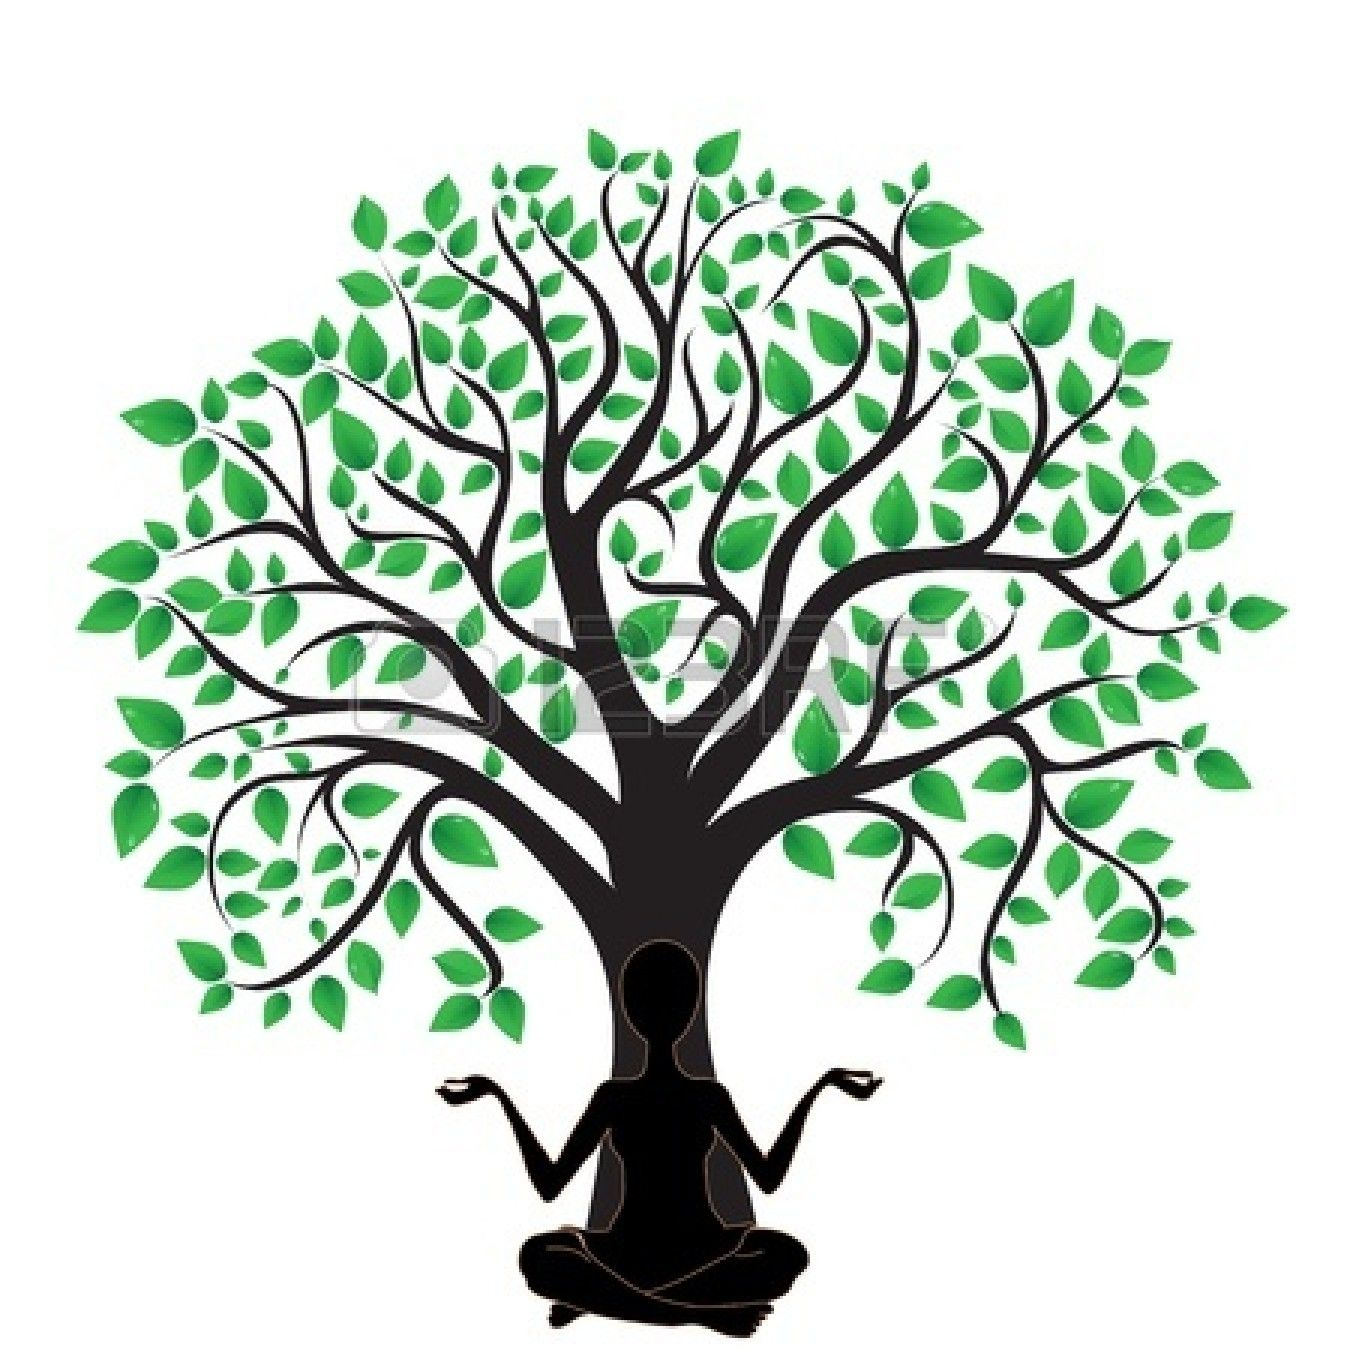 Oak Tree Silhouette Logo Clipart Panda Free Clipart Images | My ...